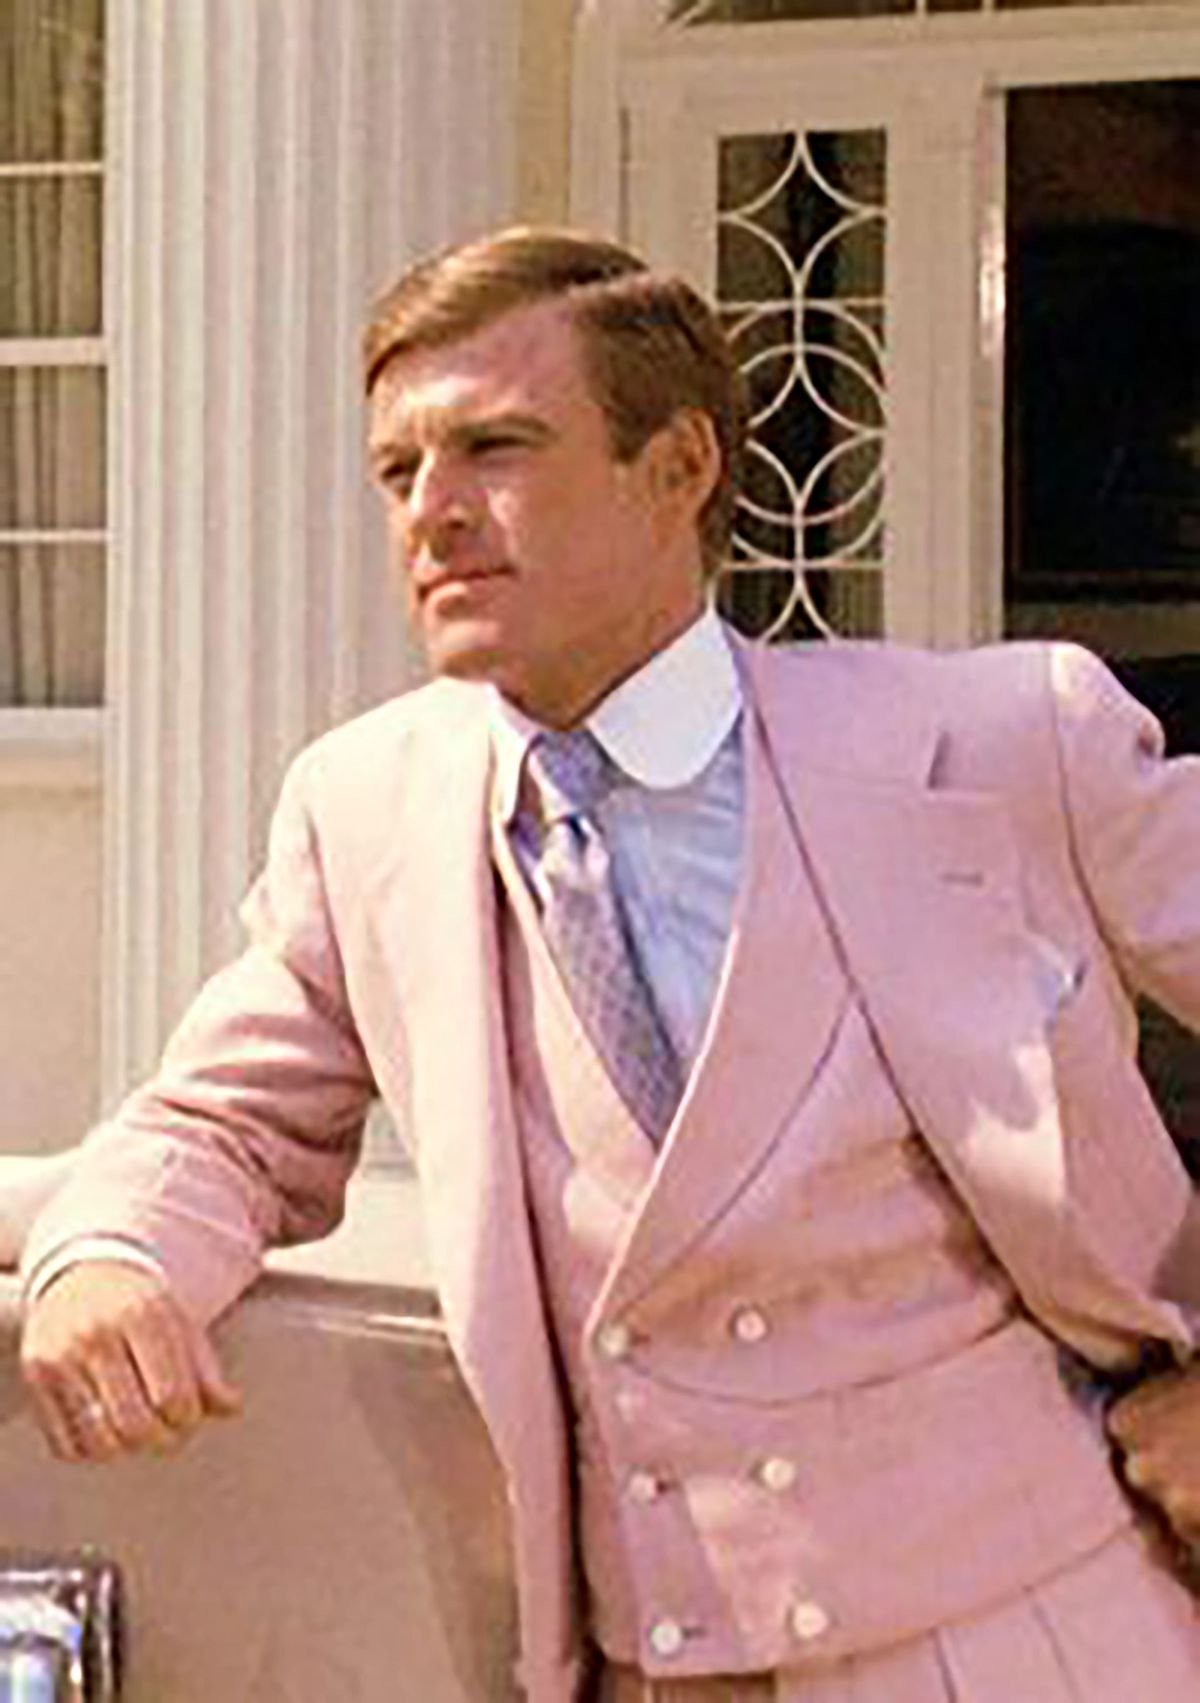 men actors wearing pink - Google Search  1c3d04fff75